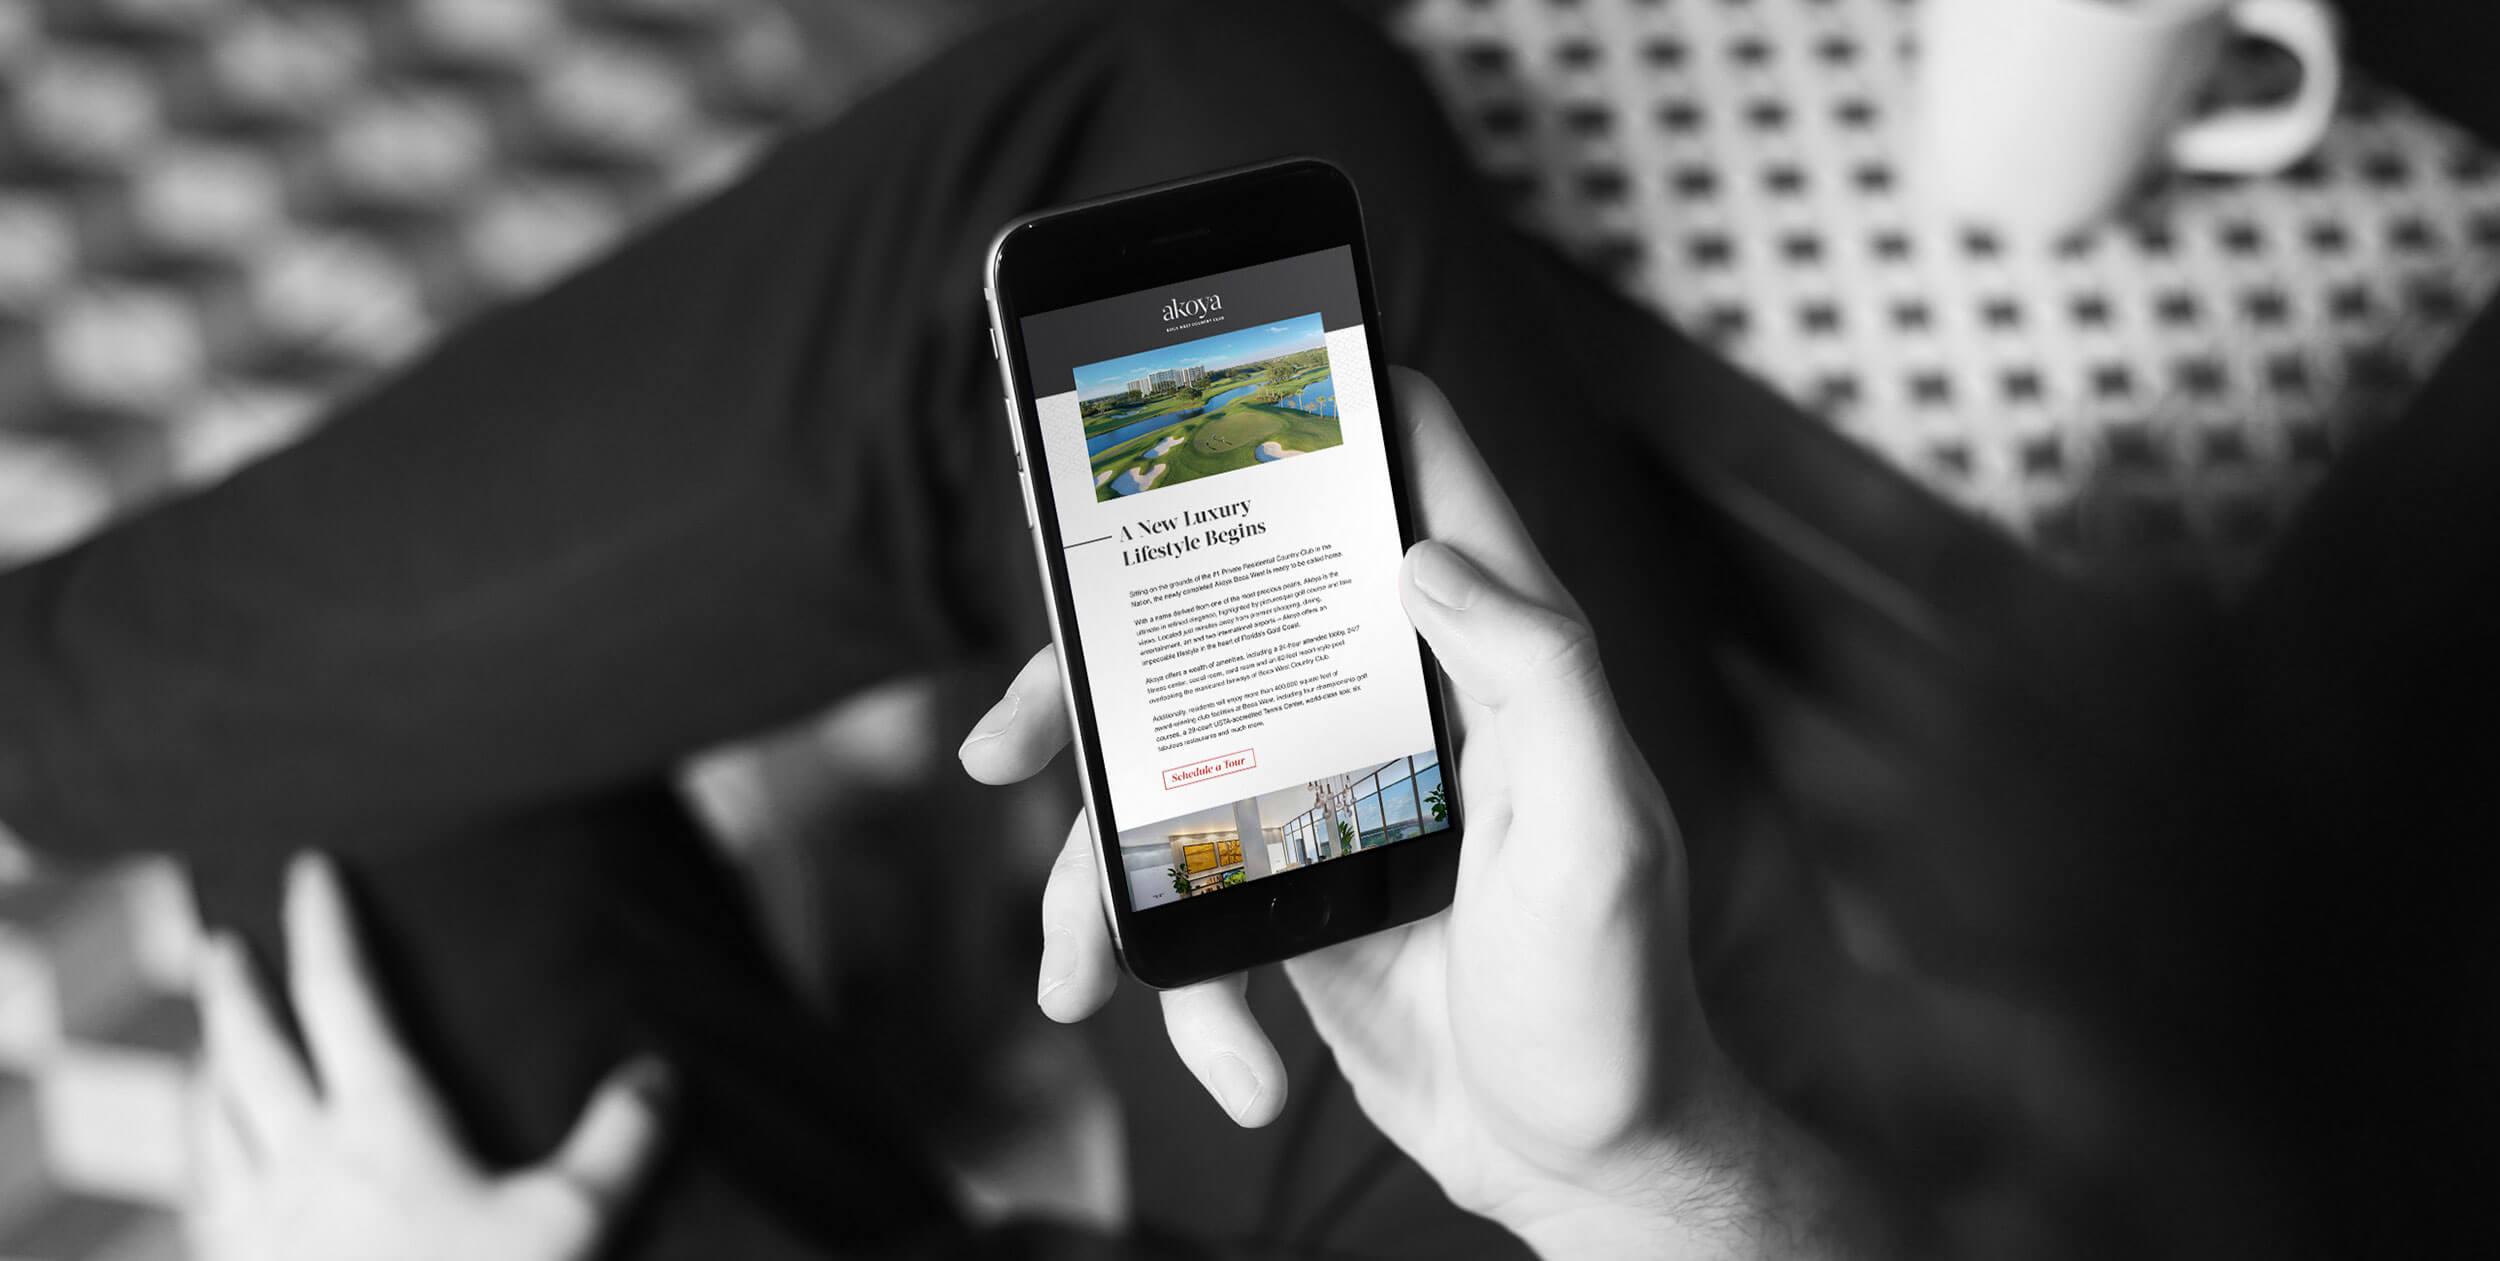 Man holding phone viewing Akoya website